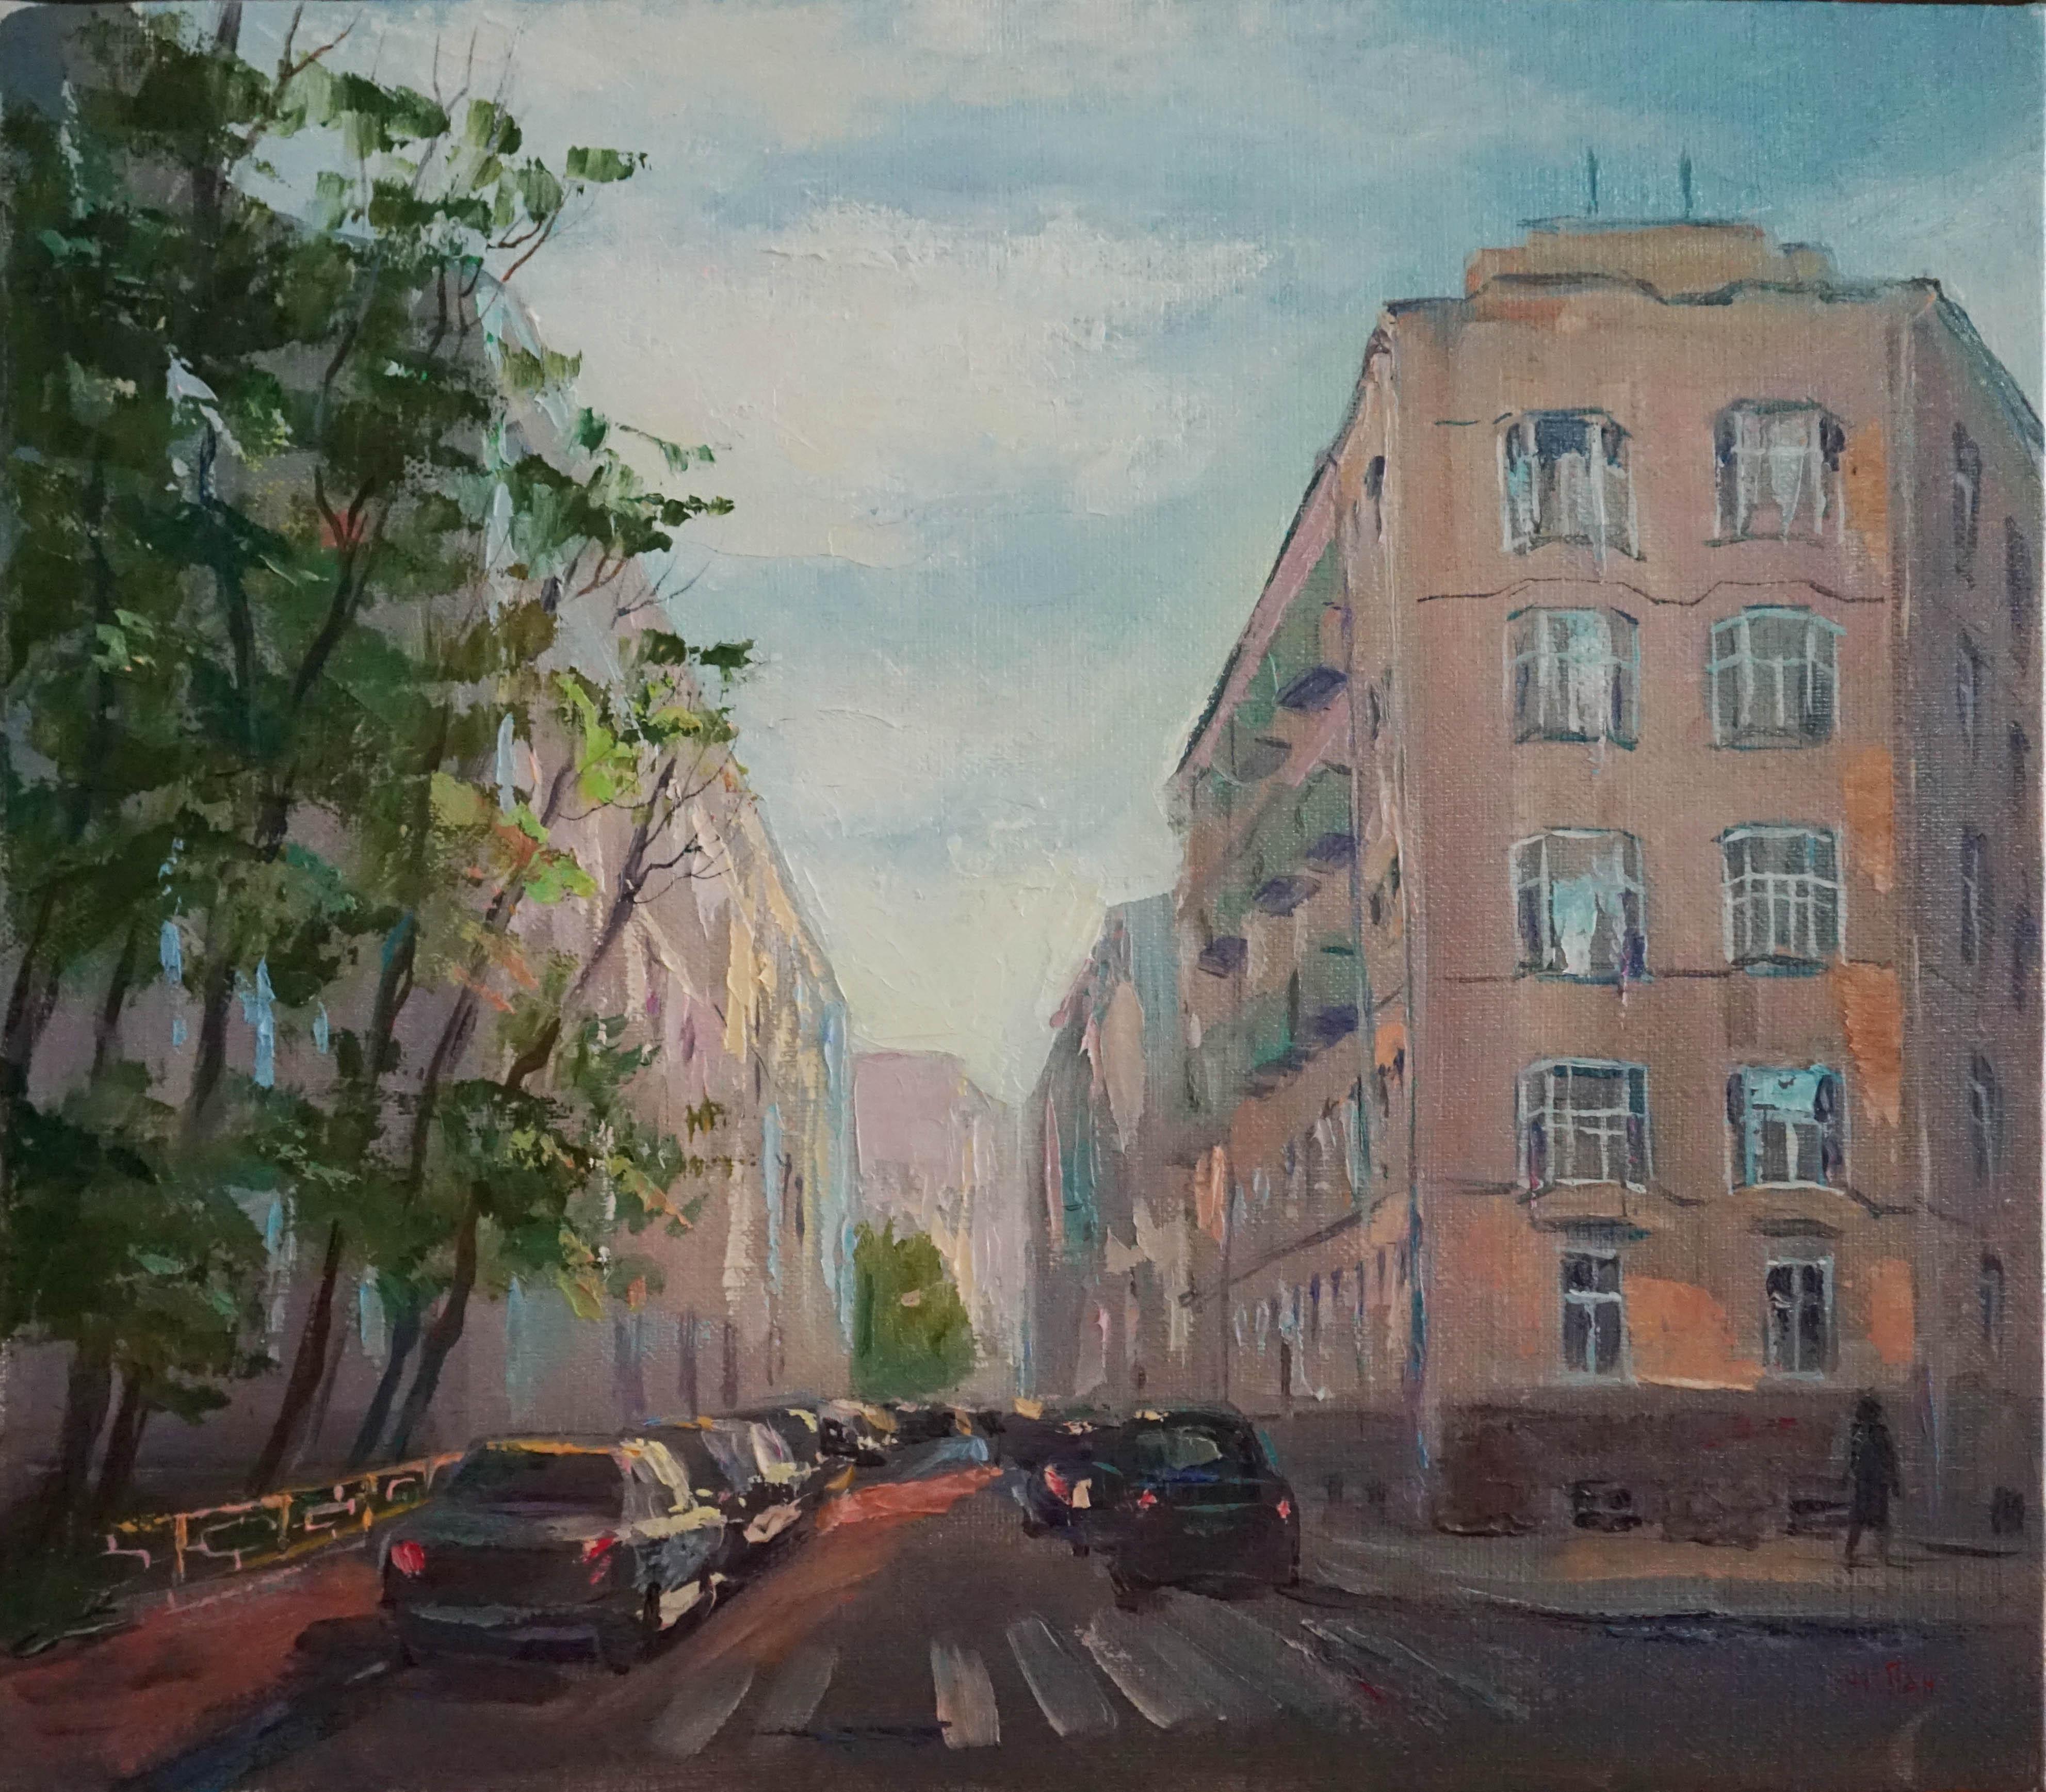 Нина Панюкова Скатертный переуок 30х35 х м